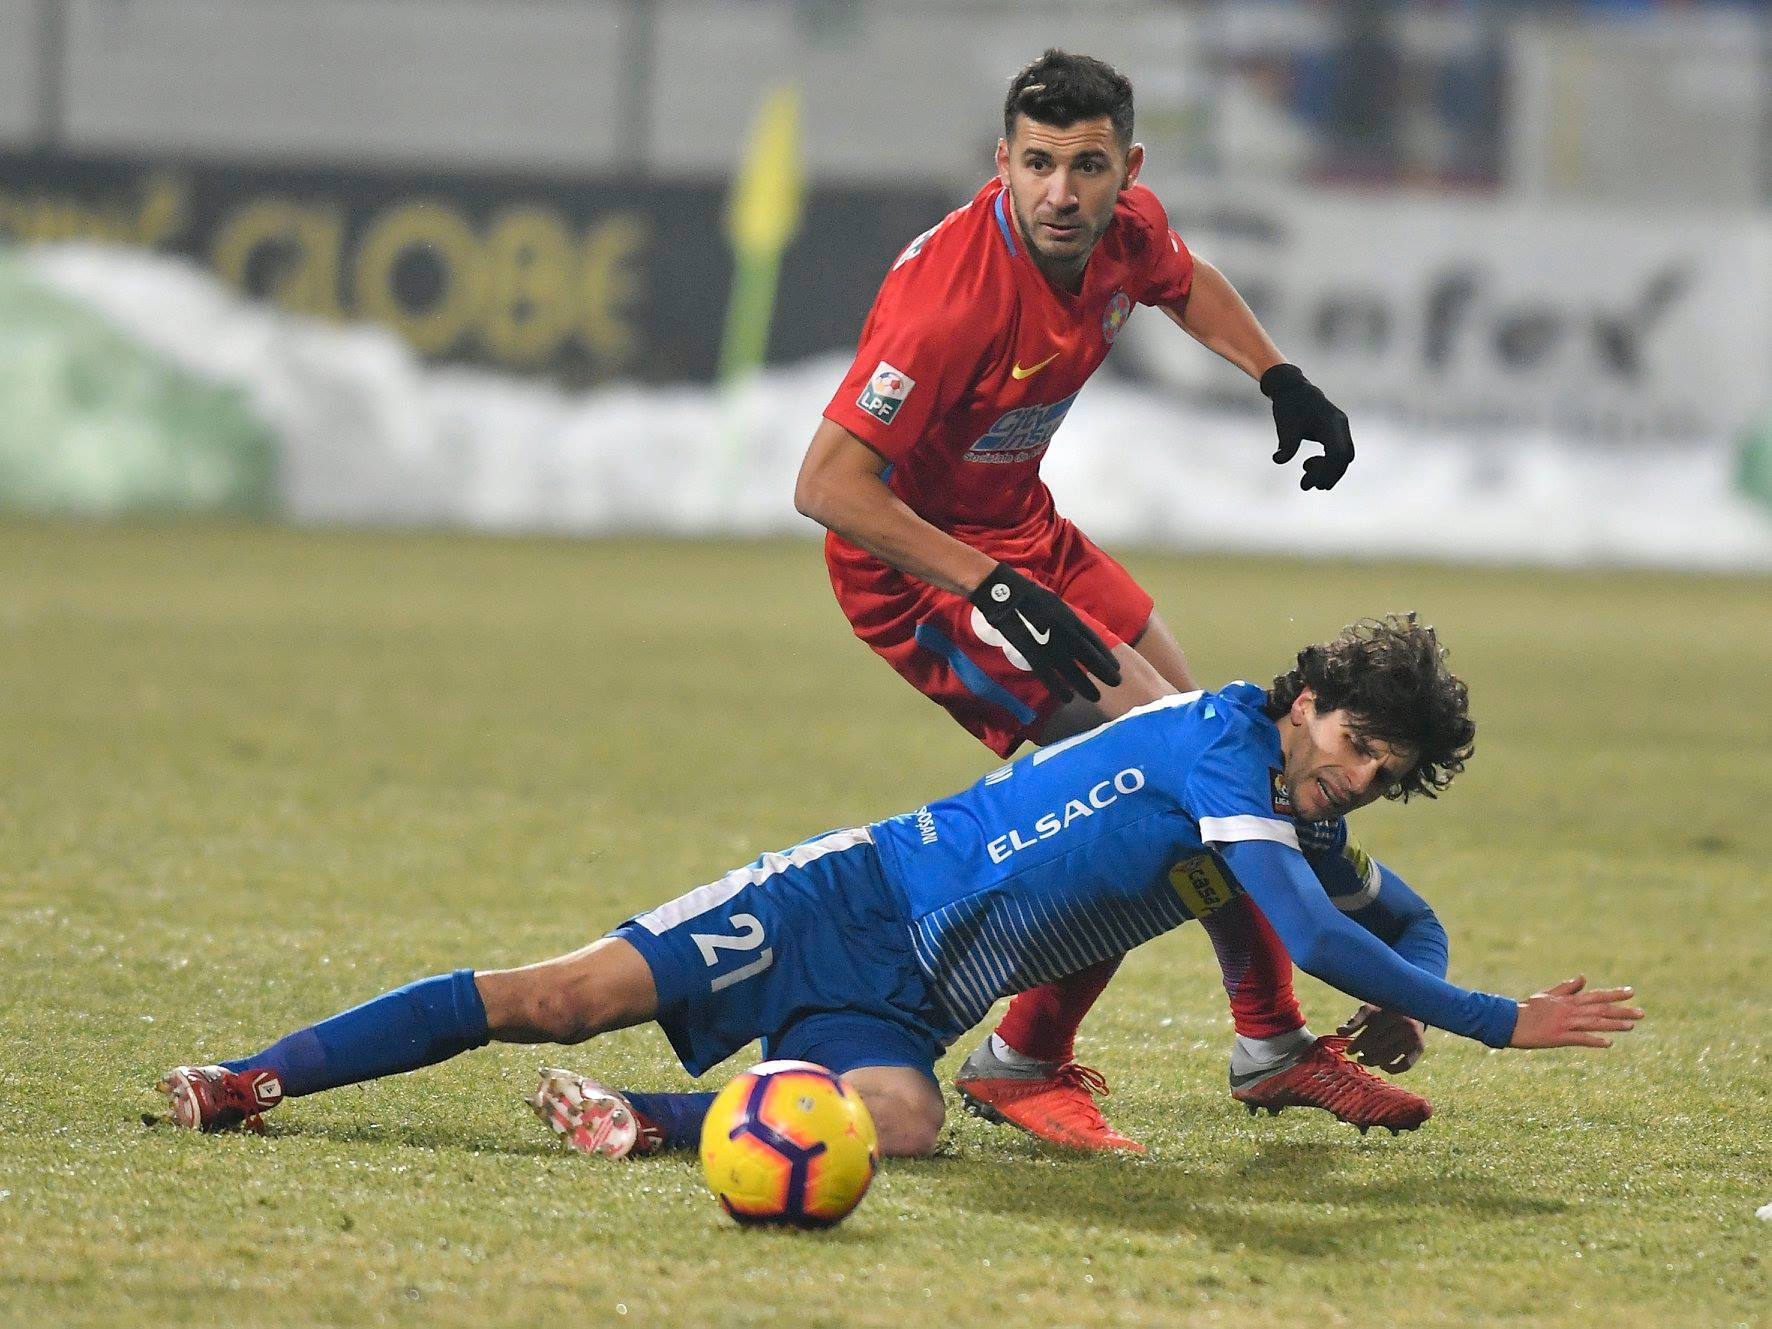 Botosani e Steaua em campo pelo Campeonato Romeno cc2f16068c968